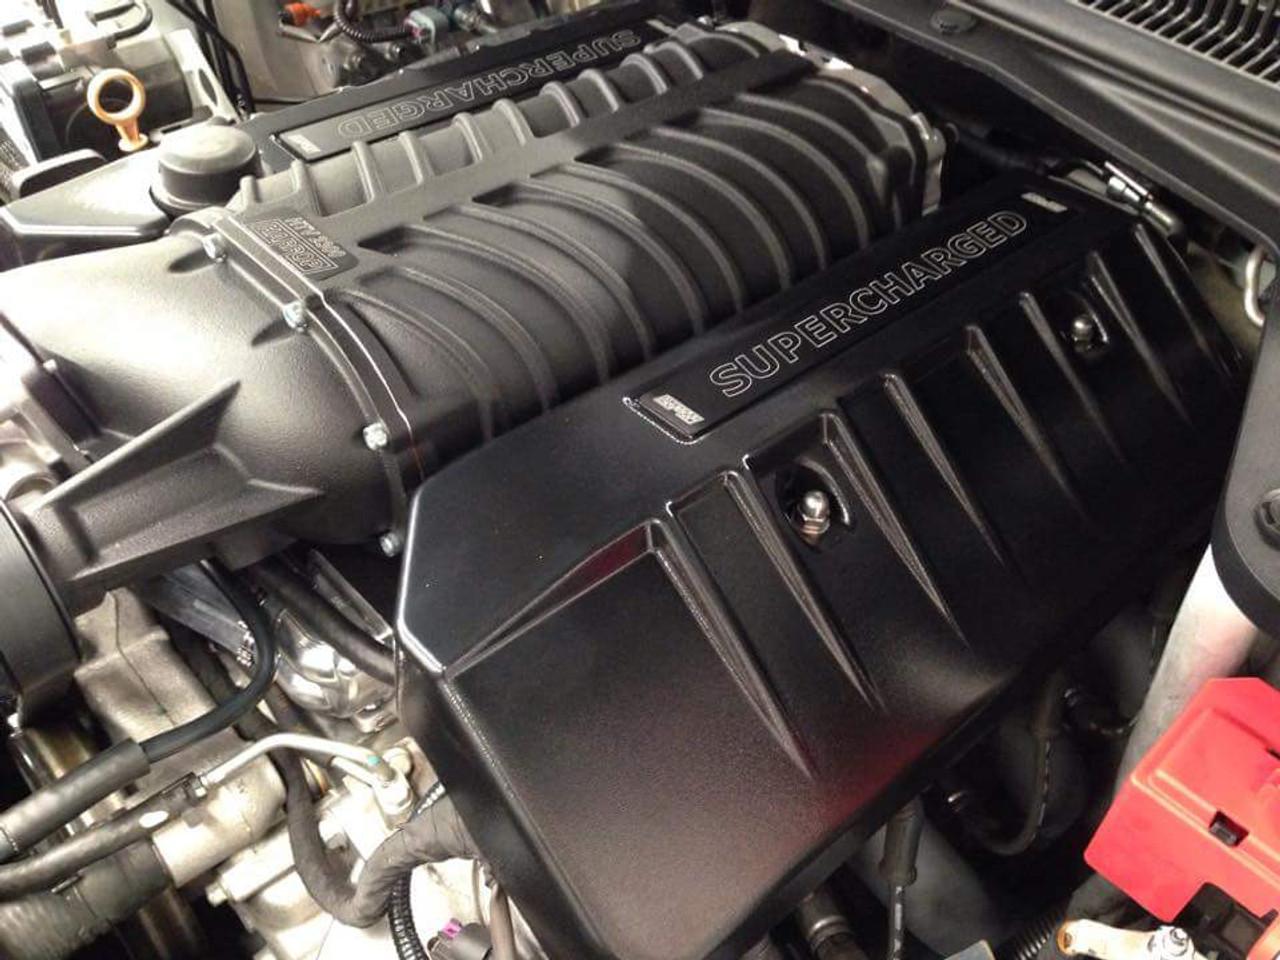 HARROP FDFI 2300 Supercharger Kit | VE - VF